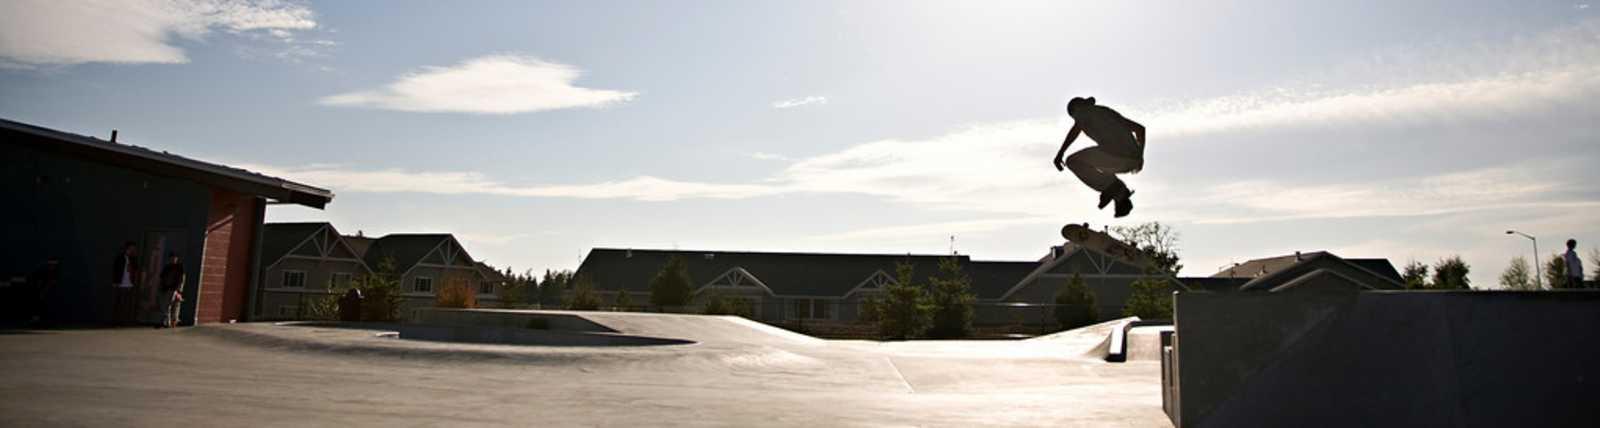 Tukwila Skate Park